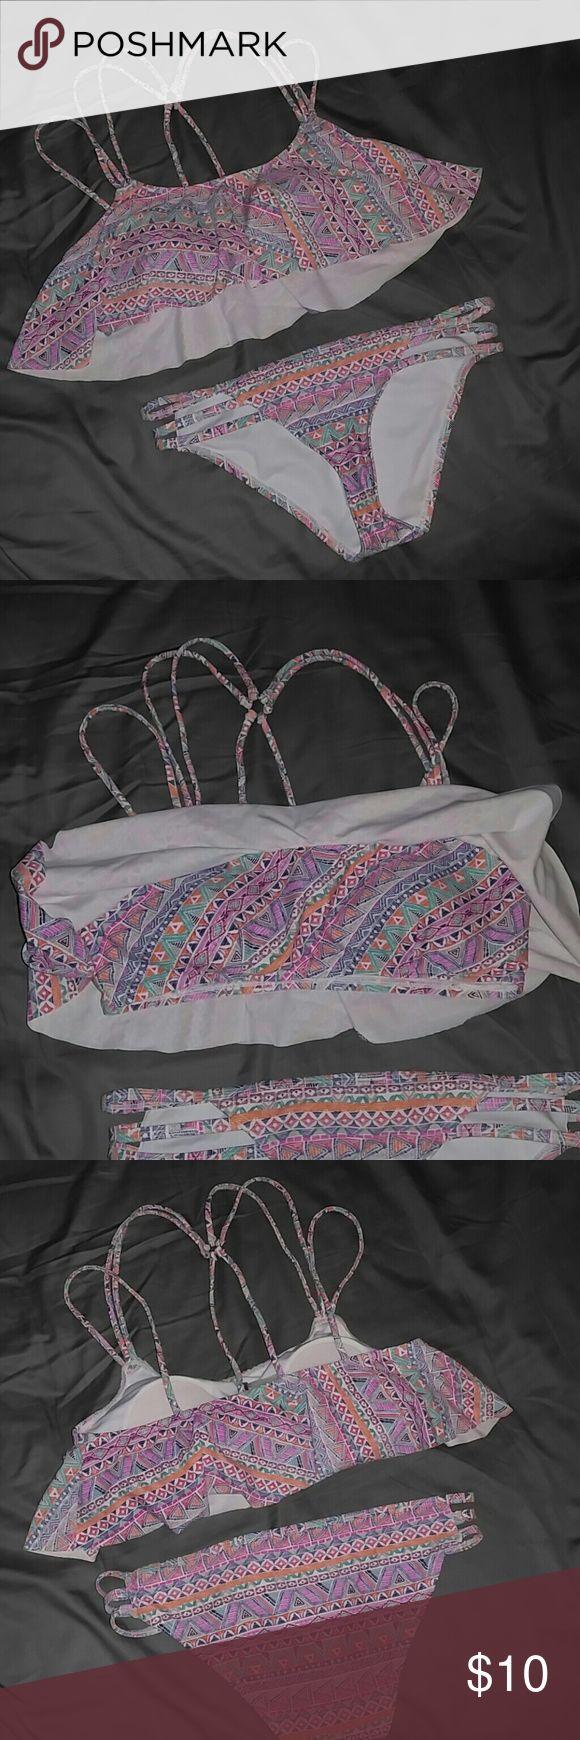 Aztec Bikini Medium Strappy Aztec pattern LA Hearts Bikini size medium. Super cute flowy top with shelf bra with built in cups. Strappy top and bottom pieces LA Hearts Swim Bikinis